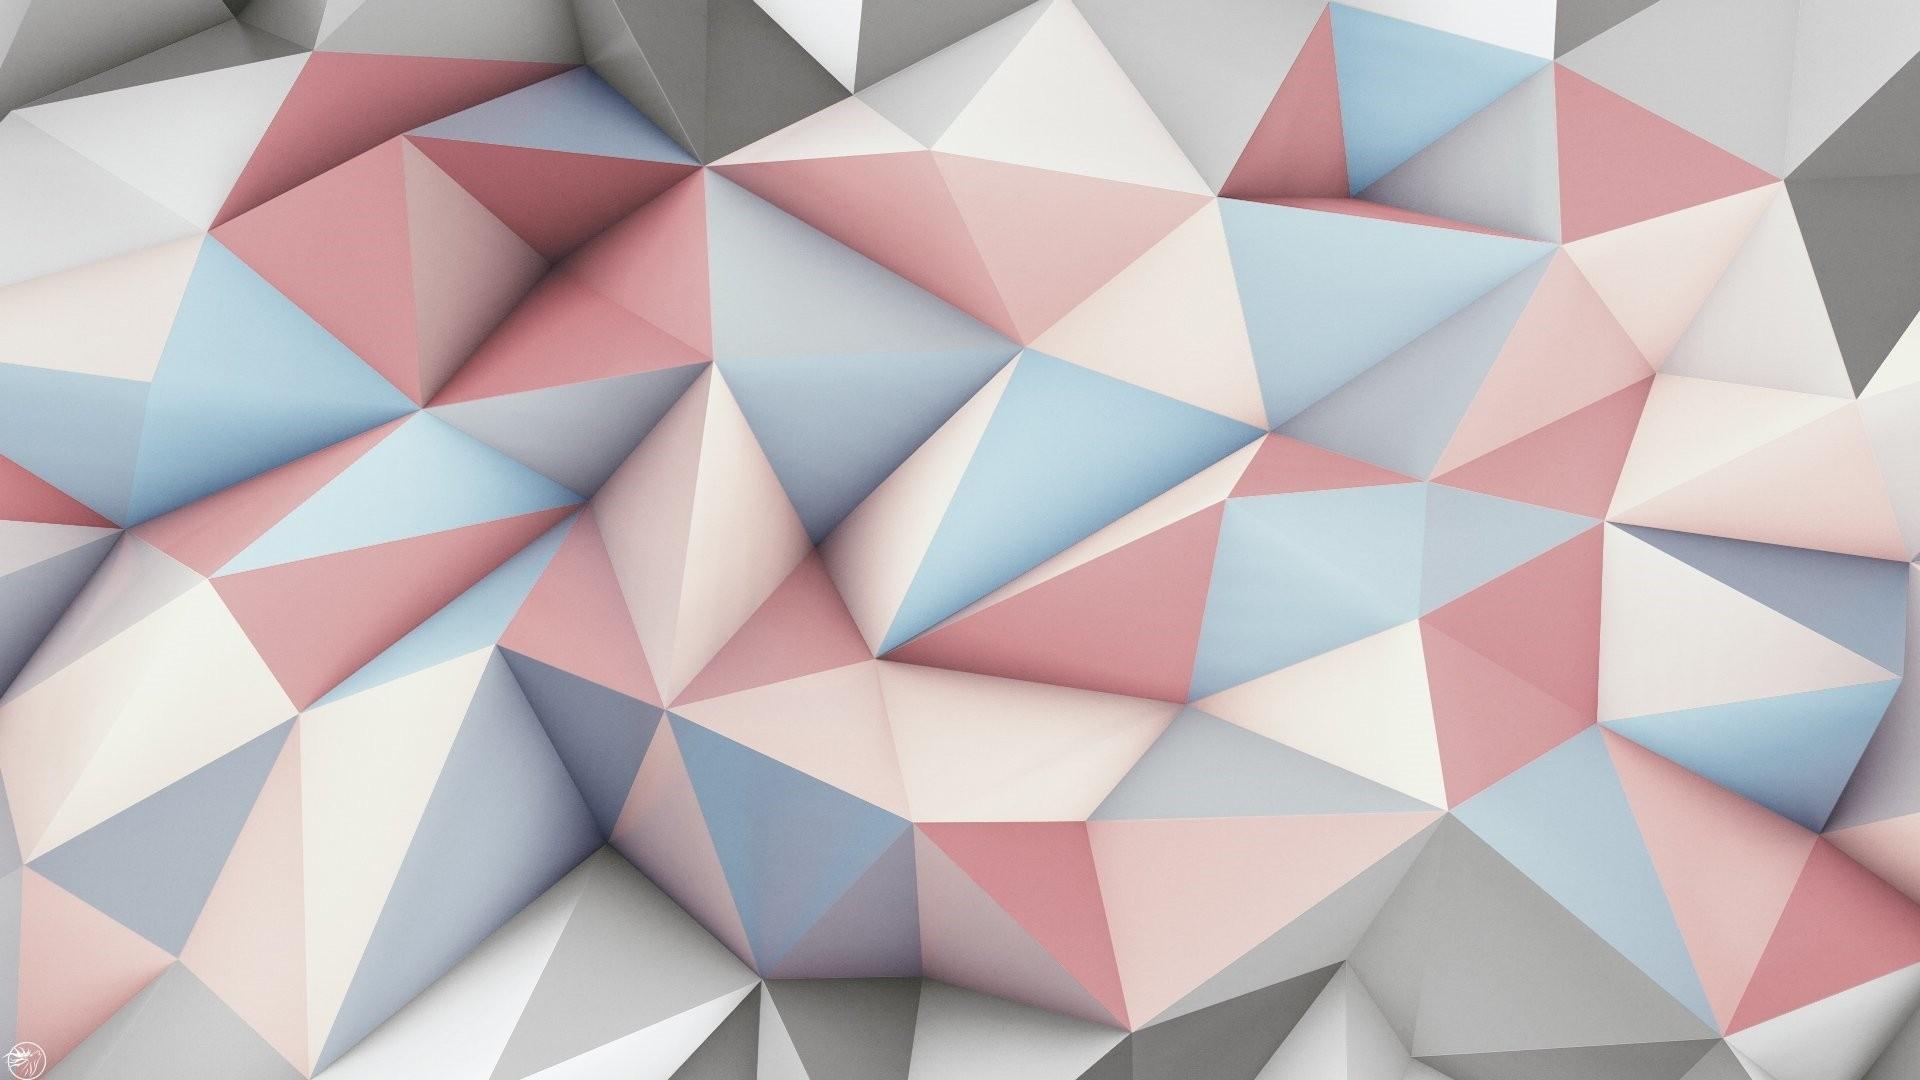 Geometric hd desktop wallpaper